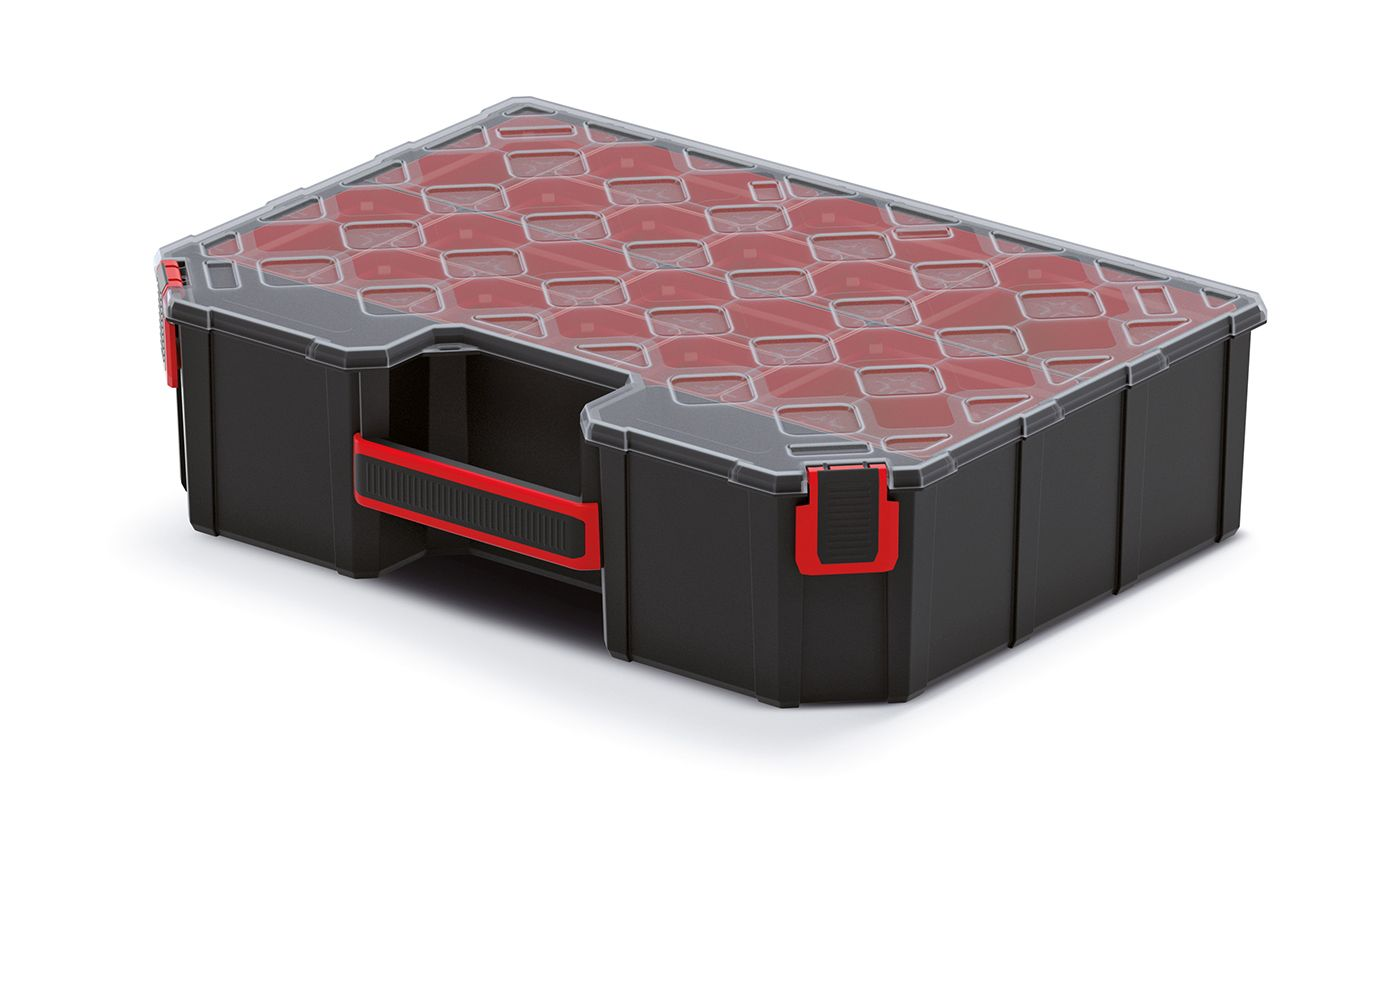 PROSPERPLAST Organizér vysoký TAGER 390x284x105 (krabičky)